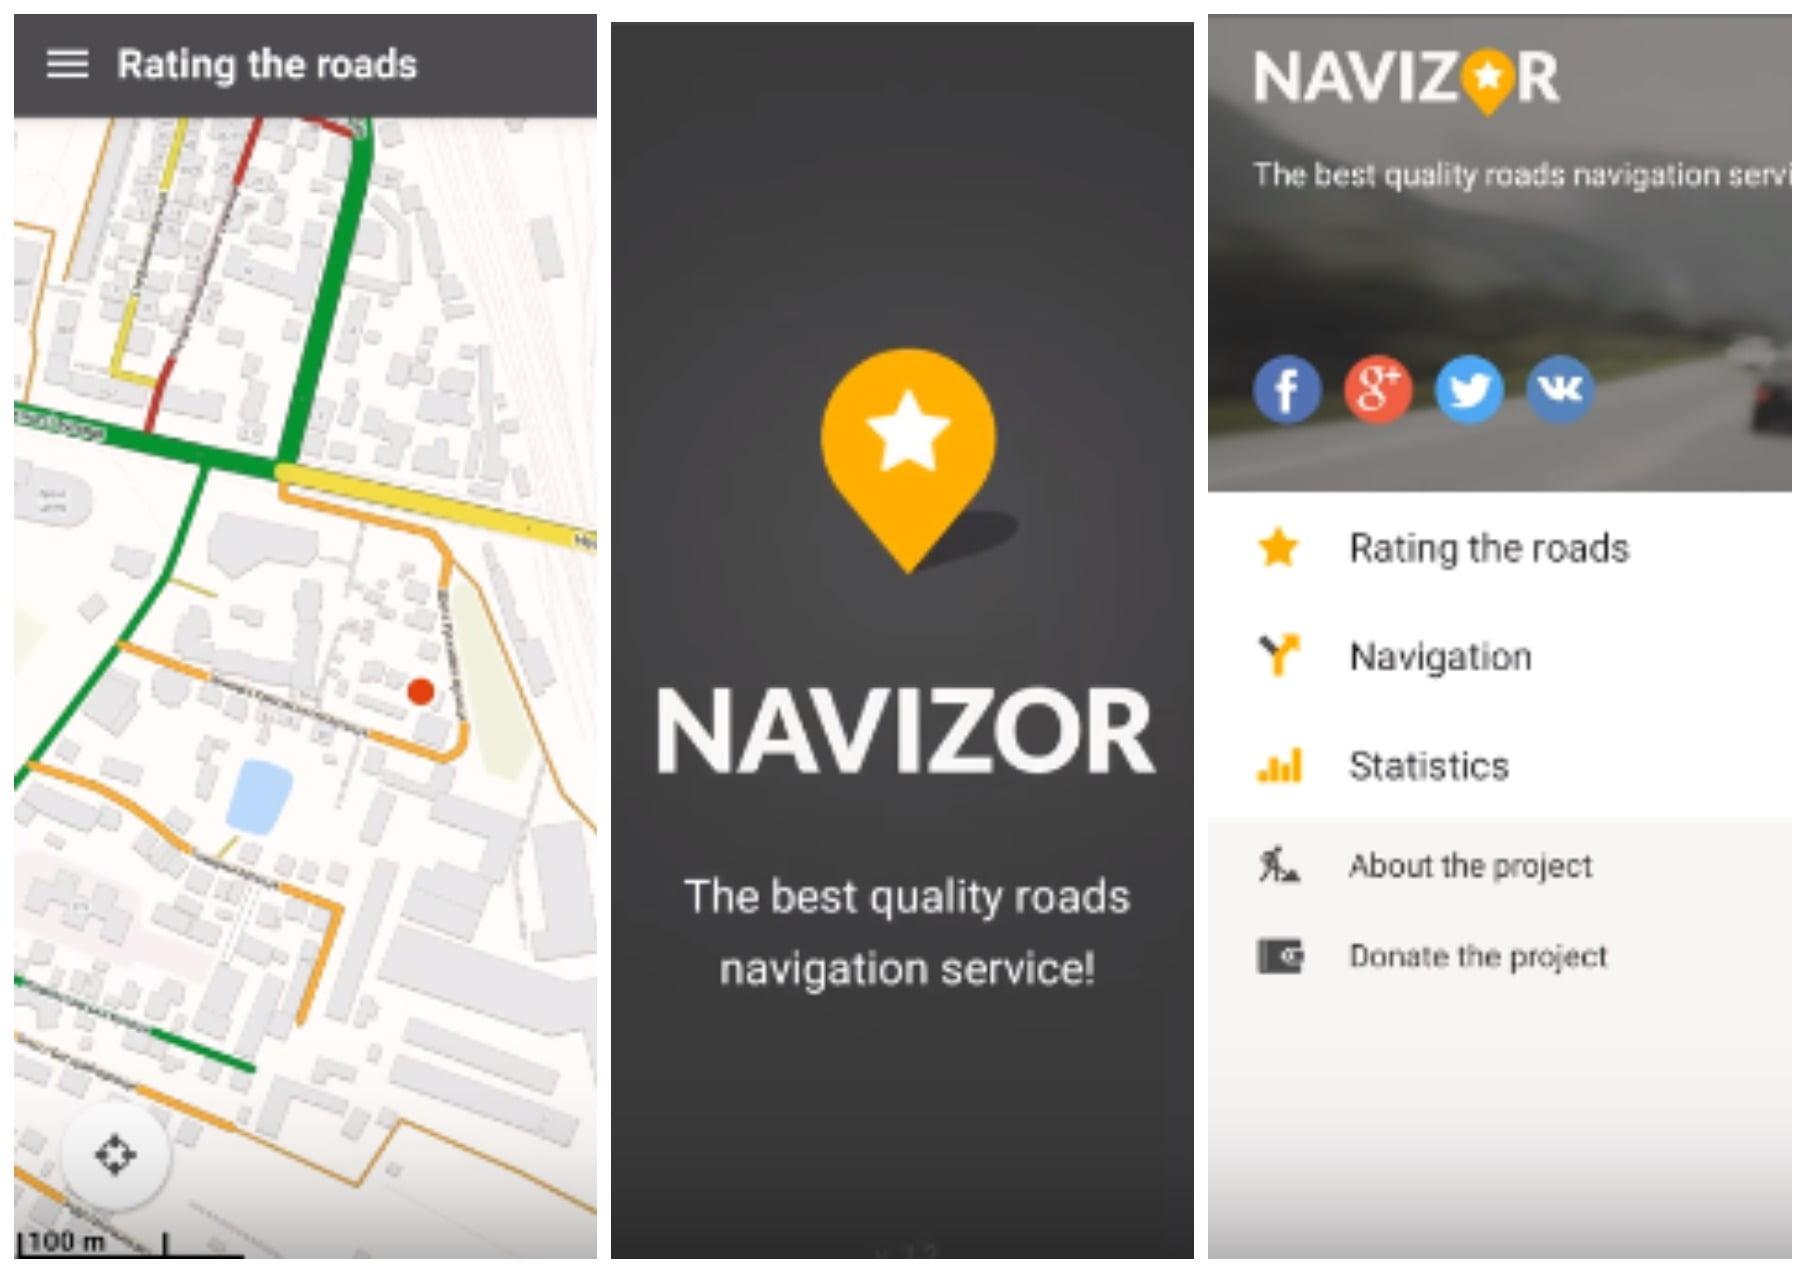 На фото изображен навигатор Navizor